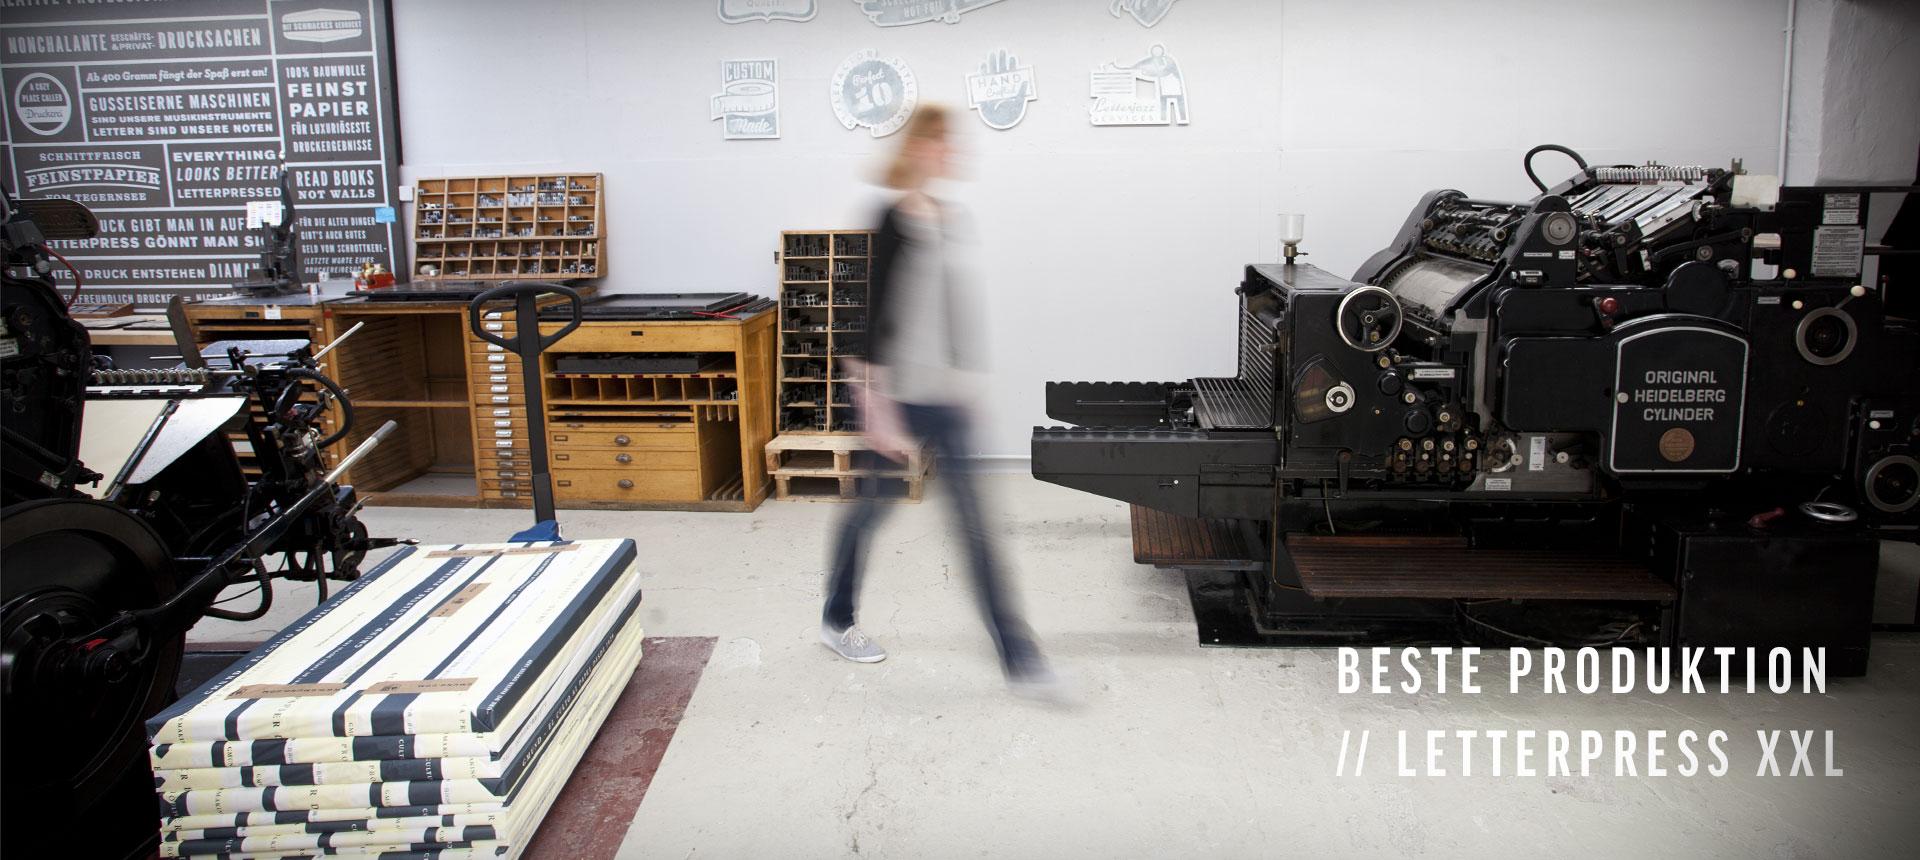 Beste Produktion // Letterpress XXL